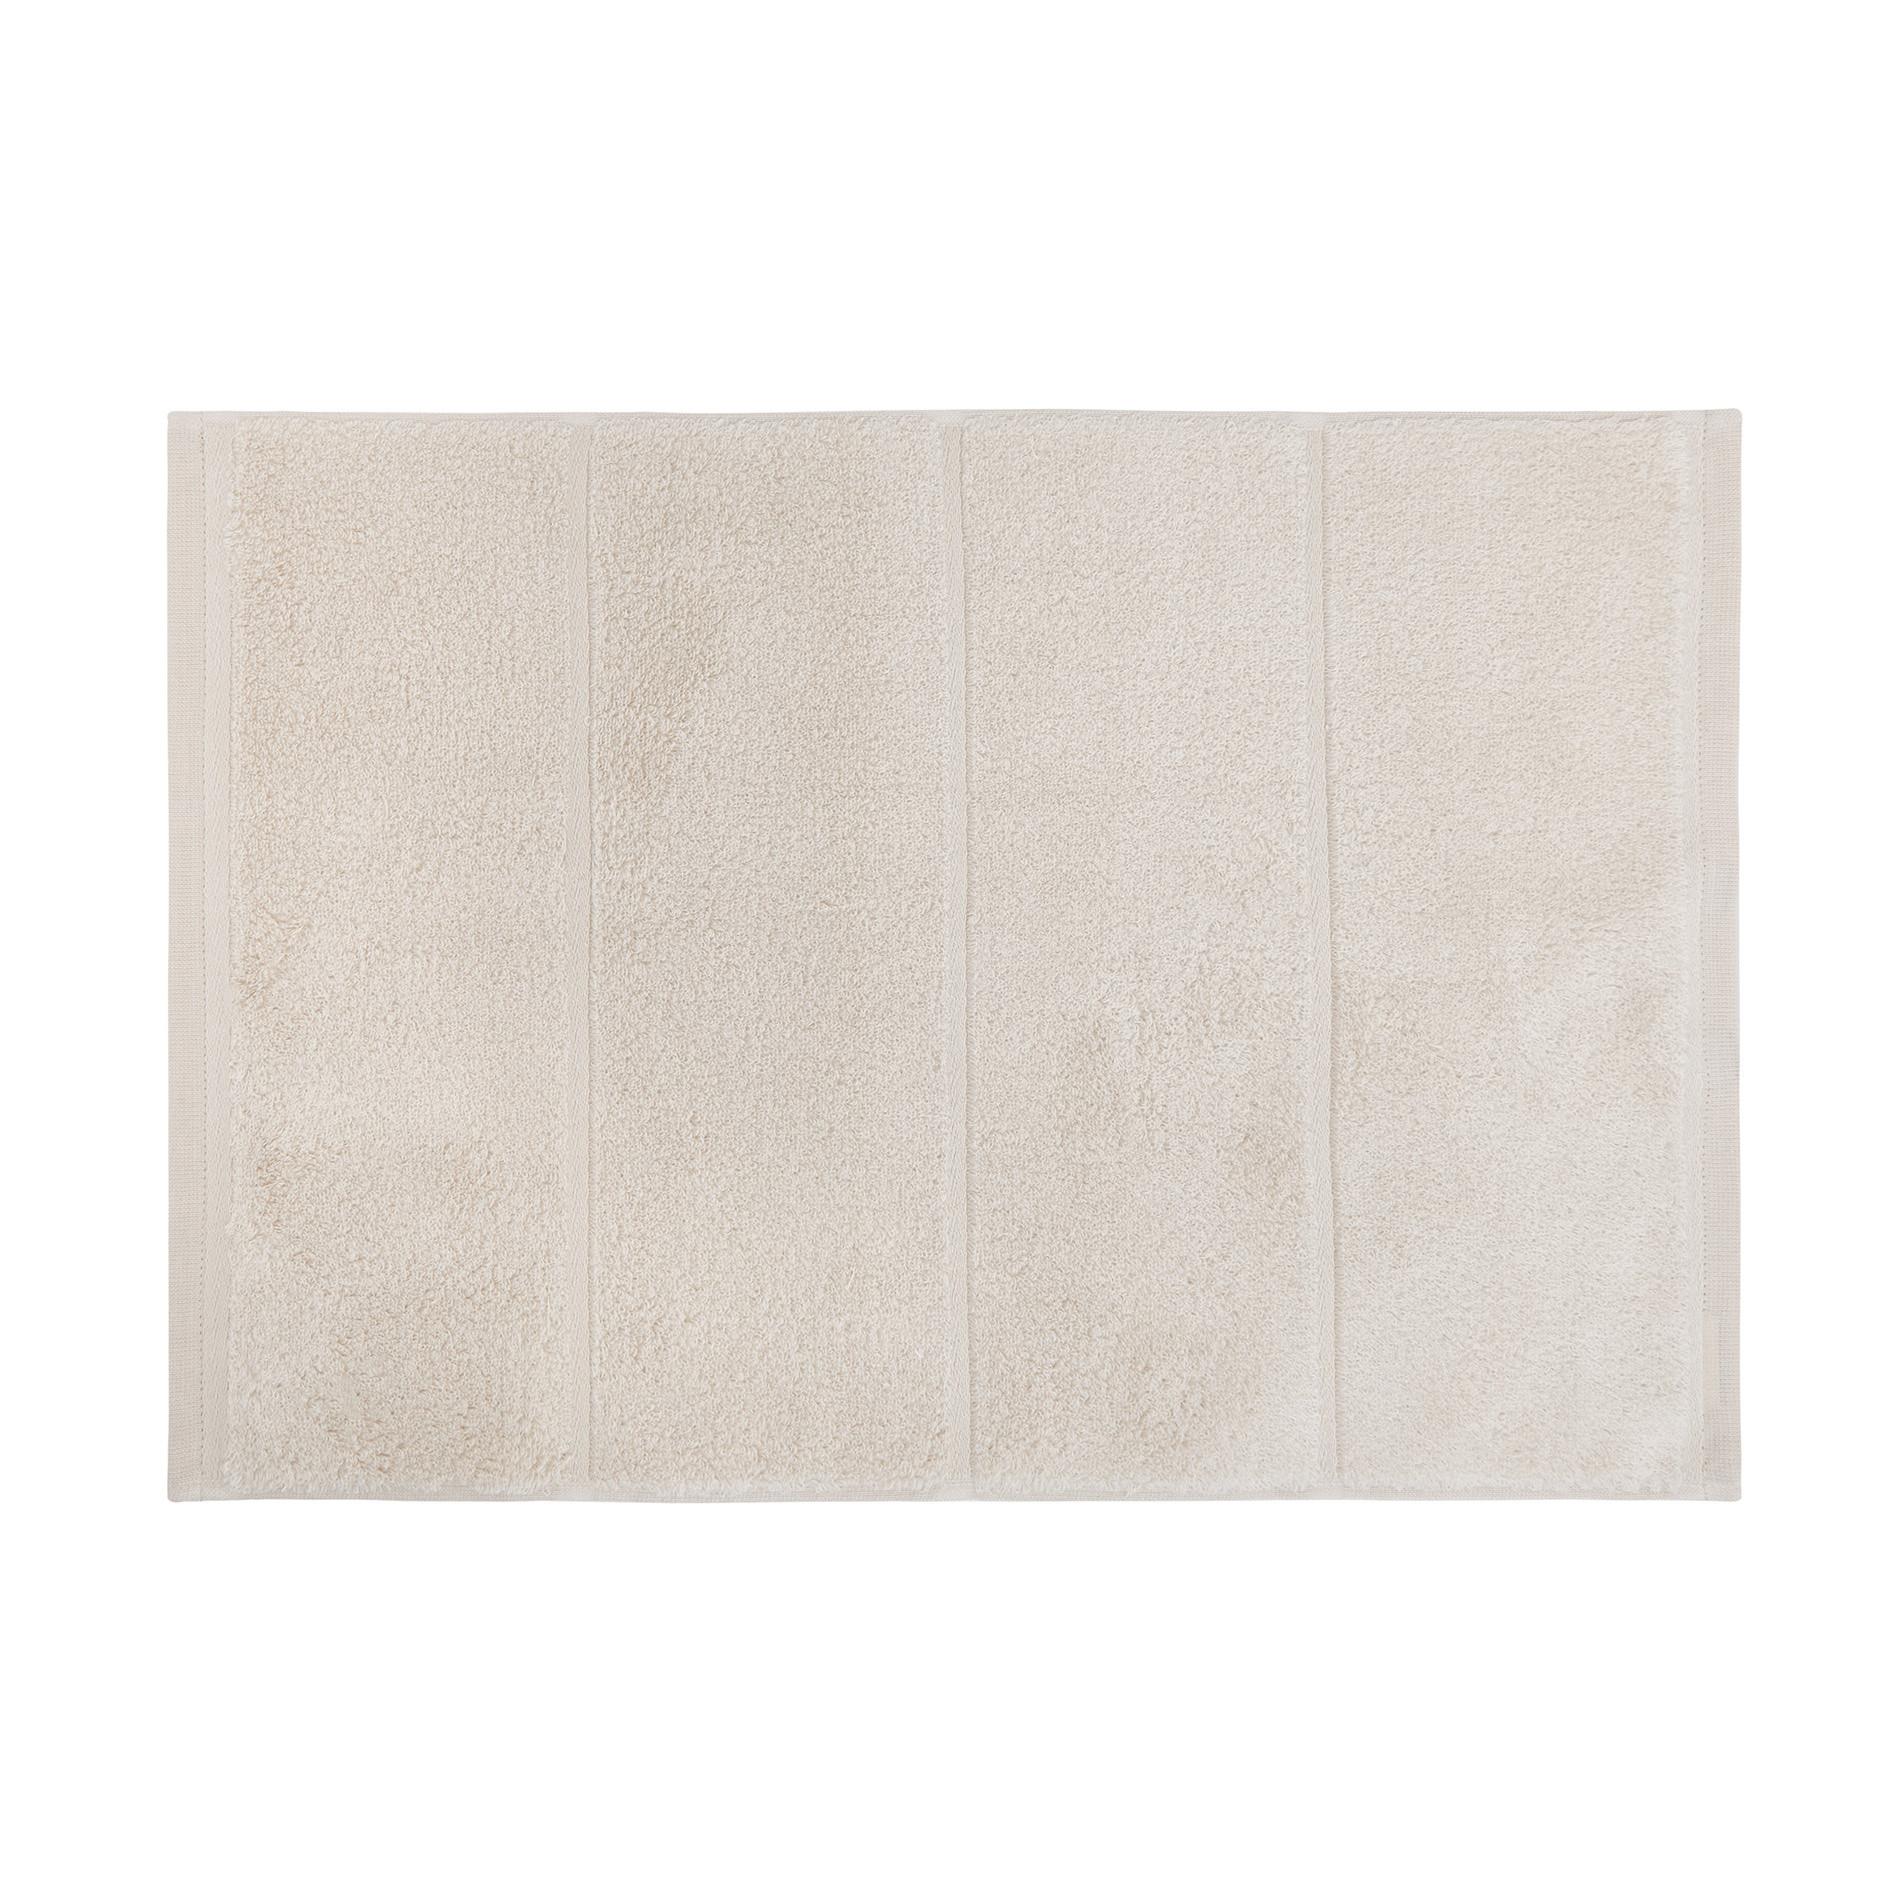 Set asciugamani spugna di cotone tinta unita, Beige, large image number 2